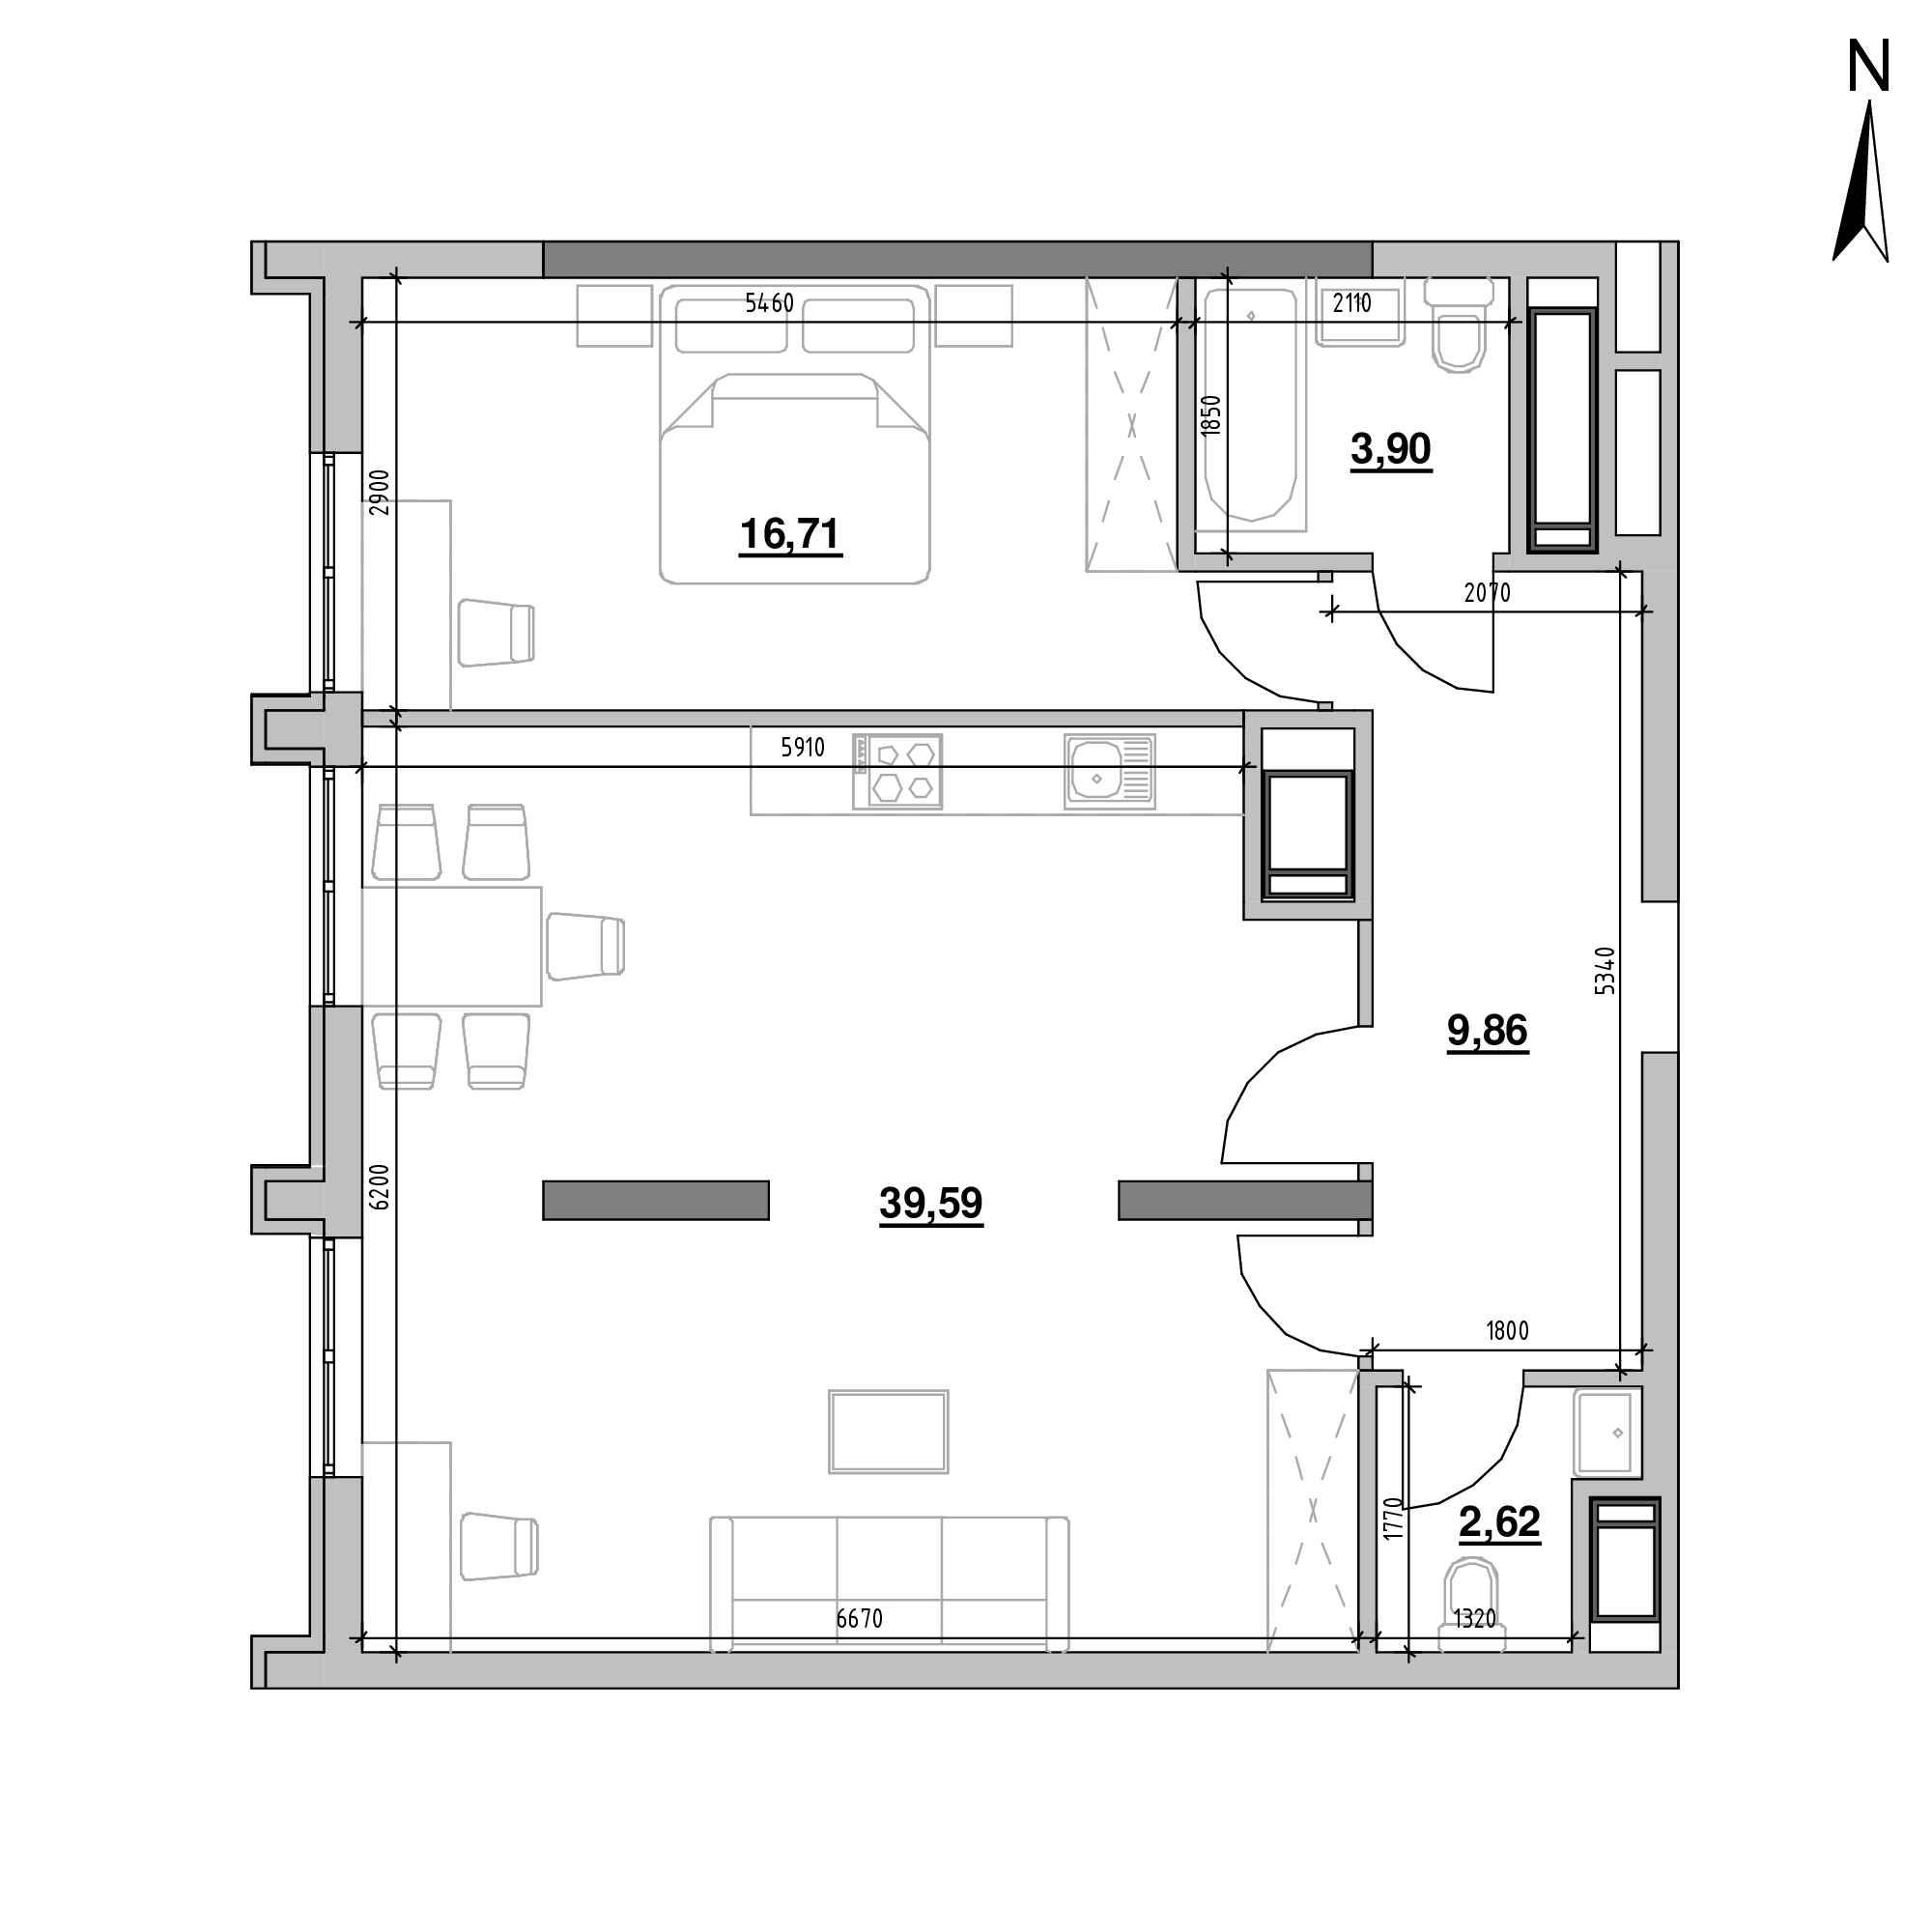 ЖК Nordica Residence: планування 1-кімнатної квартири, №5, 72.68 м<sup>2</sup>